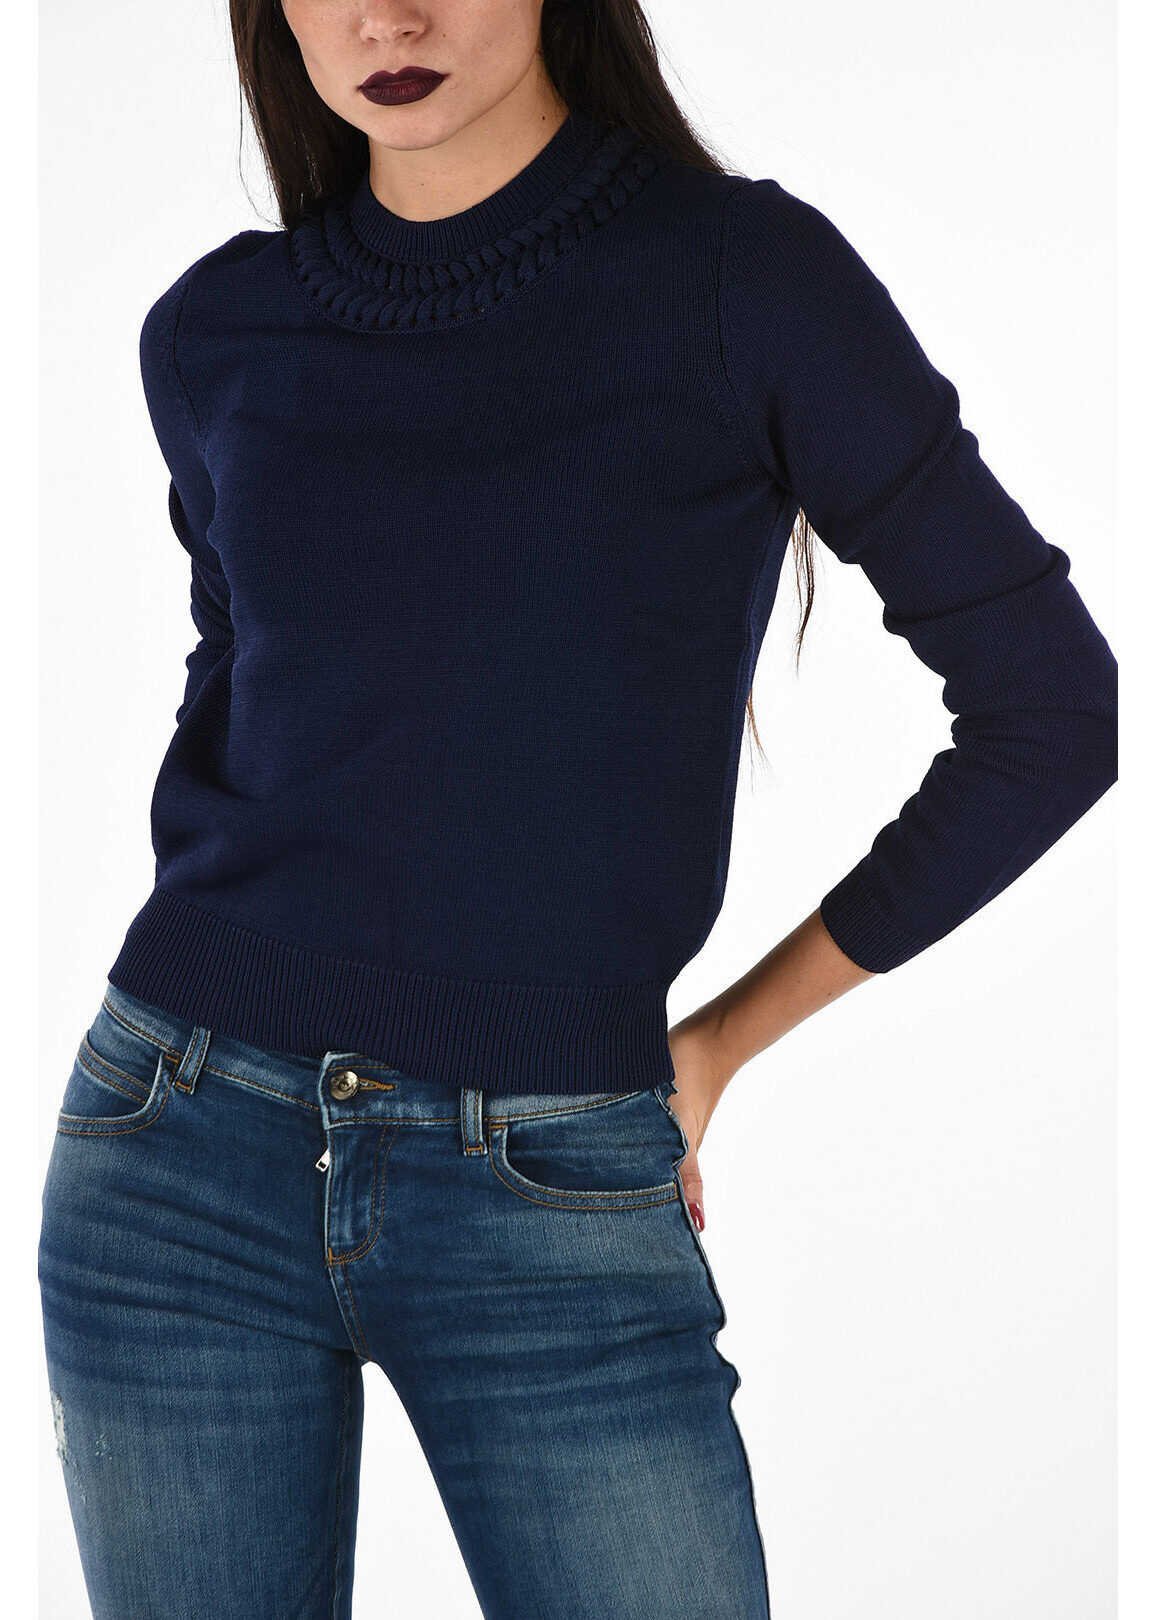 Armani EMPORIO Embroidered Round Necked Sweater BLUE